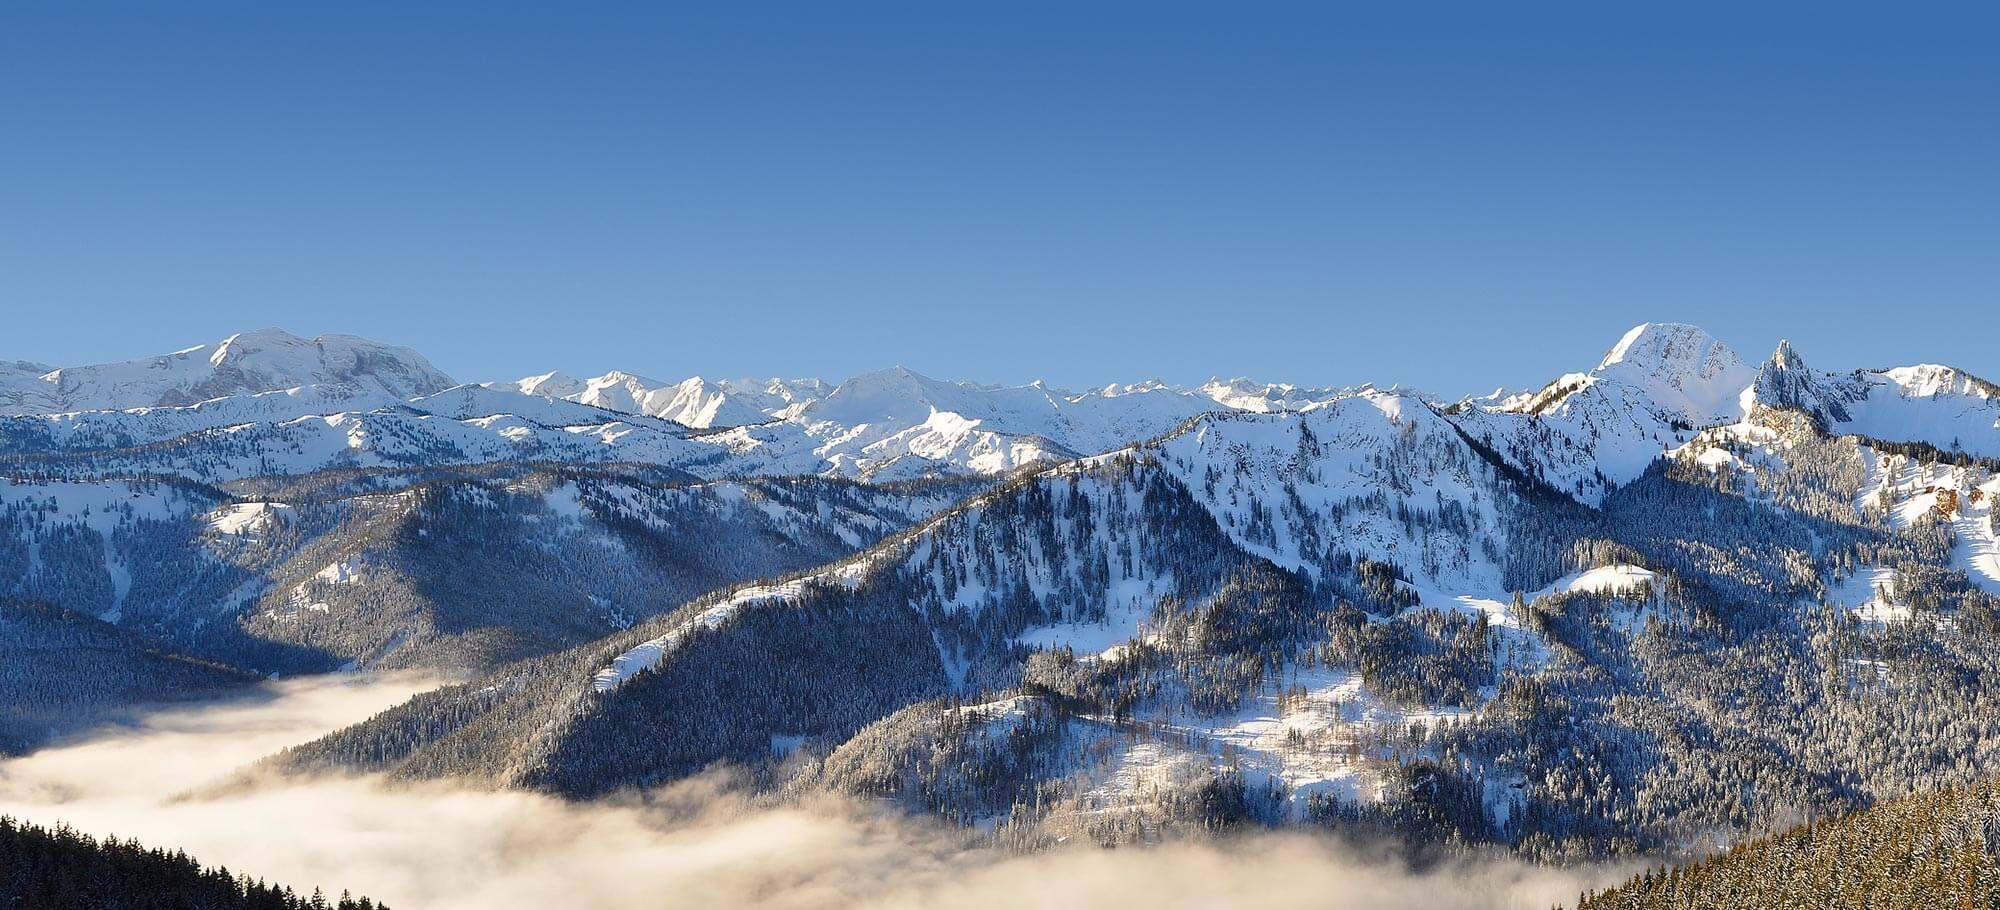 Panoramablick vom Rosskopf am Spitzing